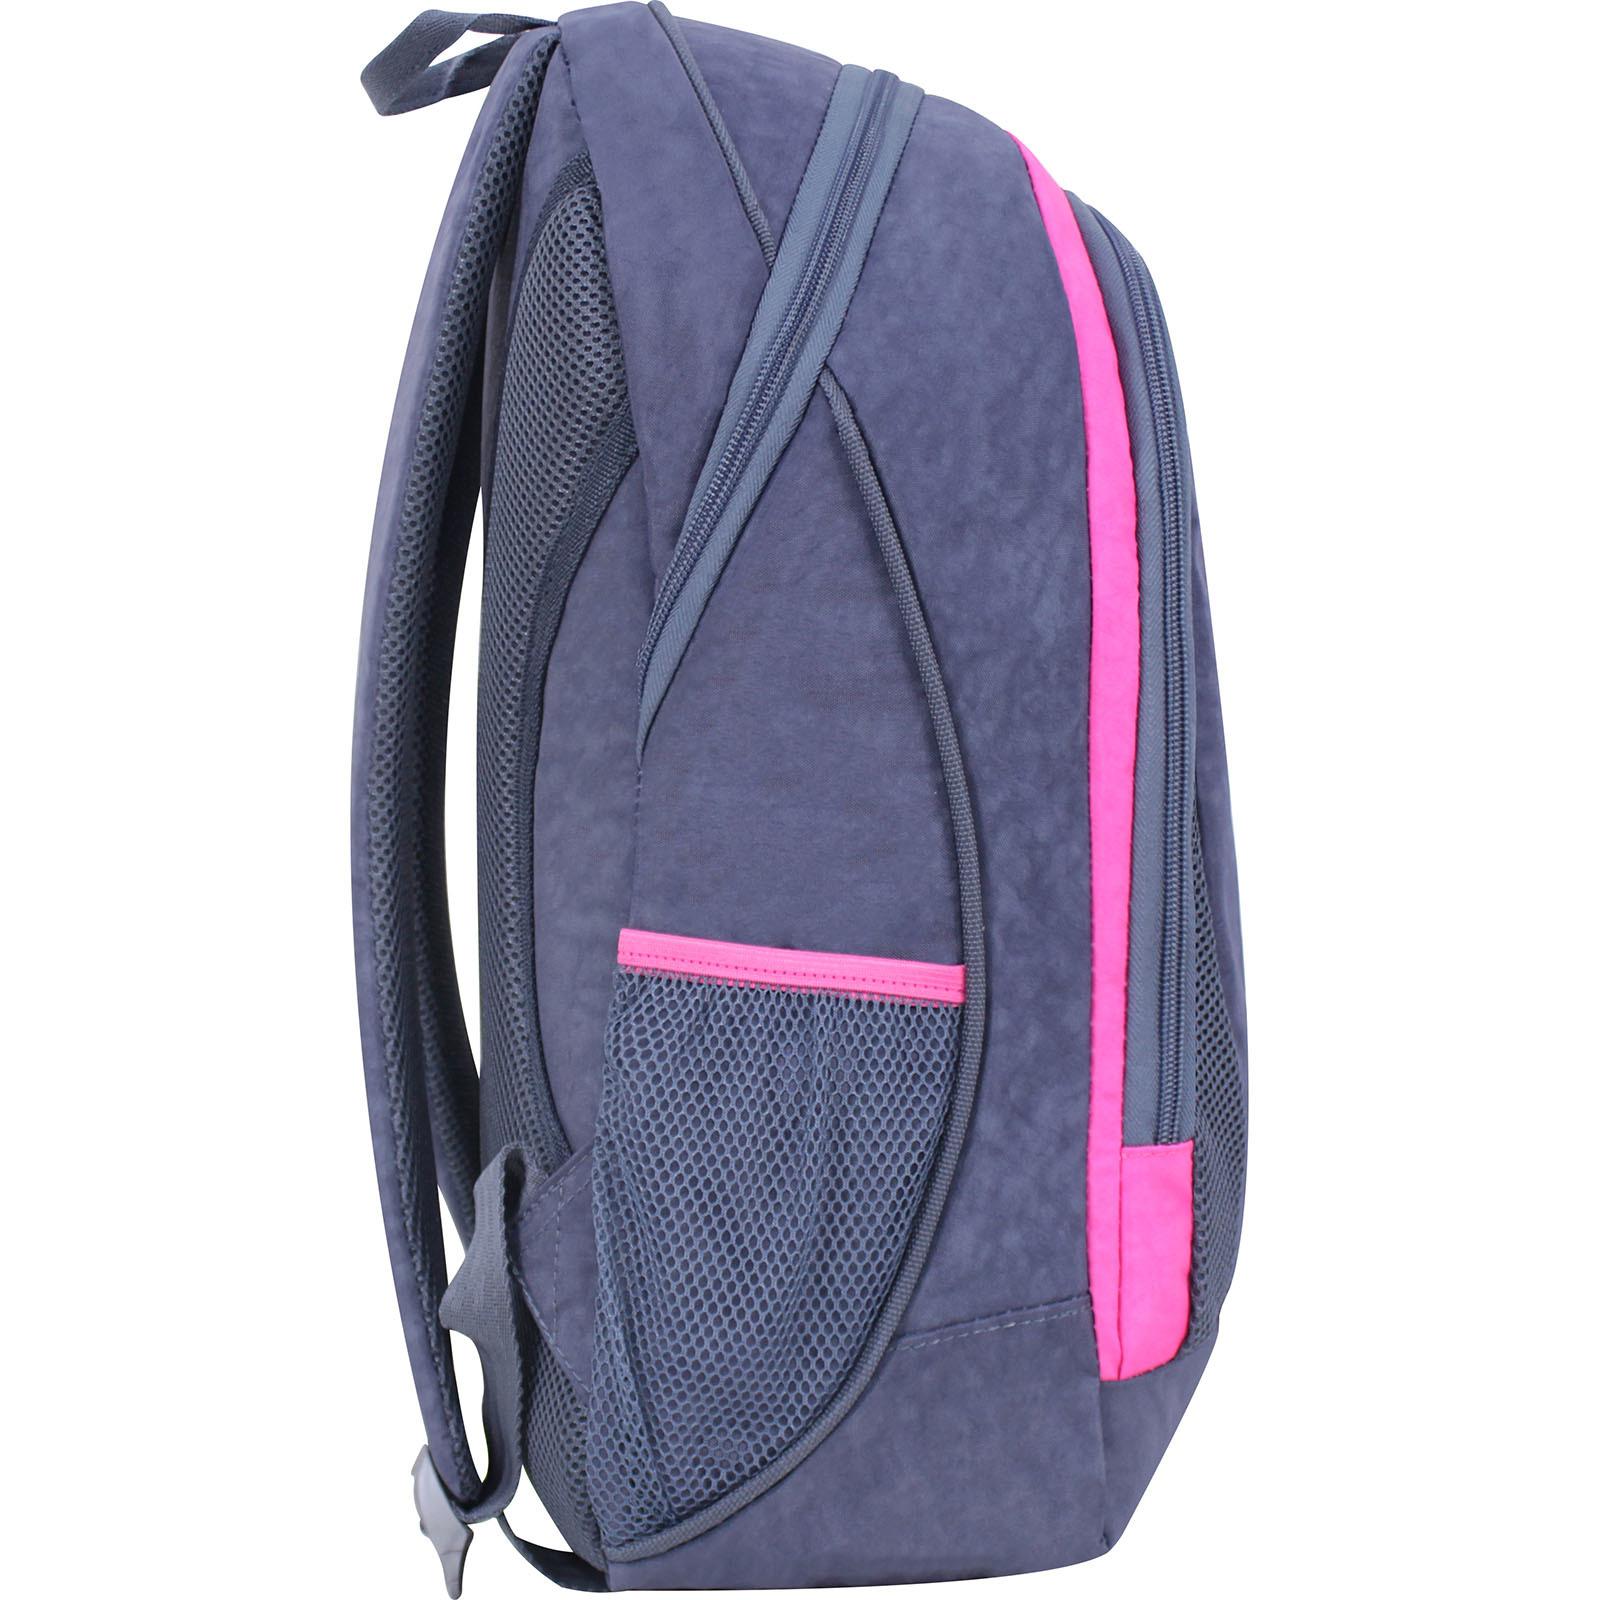 Рюкзак Bagland Ураган 20 л. Серый/розовый (0057470)